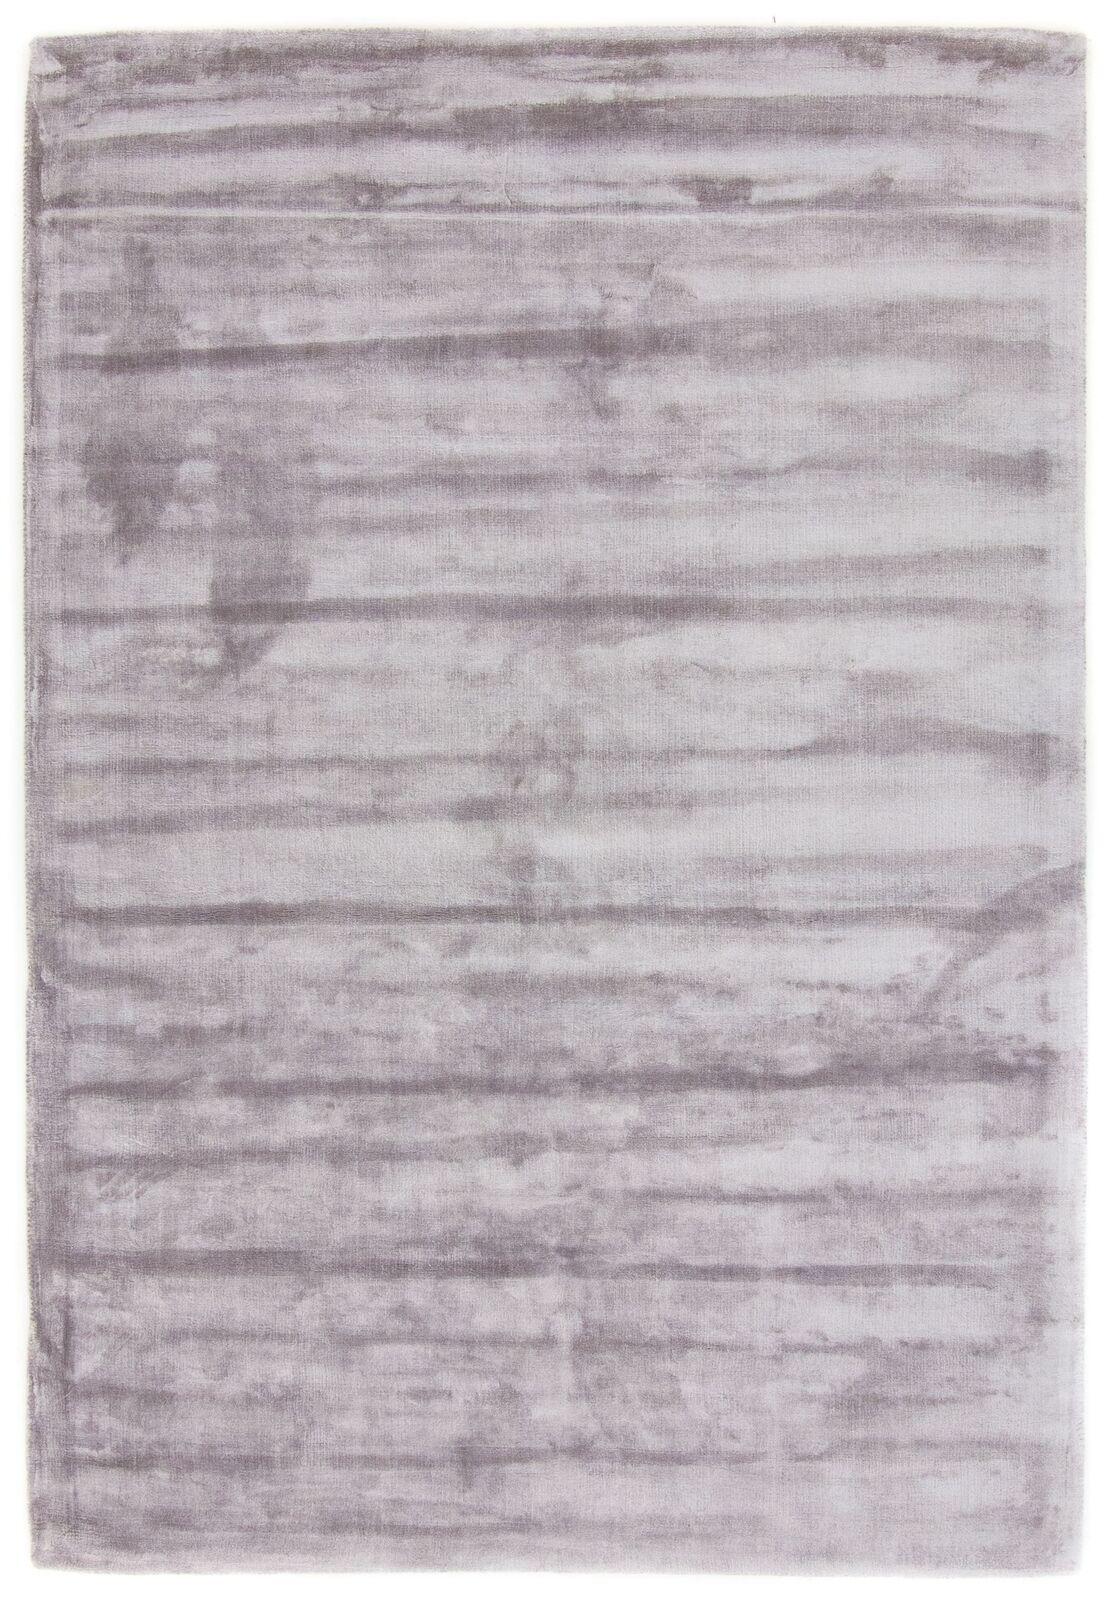 Carpetfine  Visconti Lily Teppich Silber - - - Einfarbig 26d7db